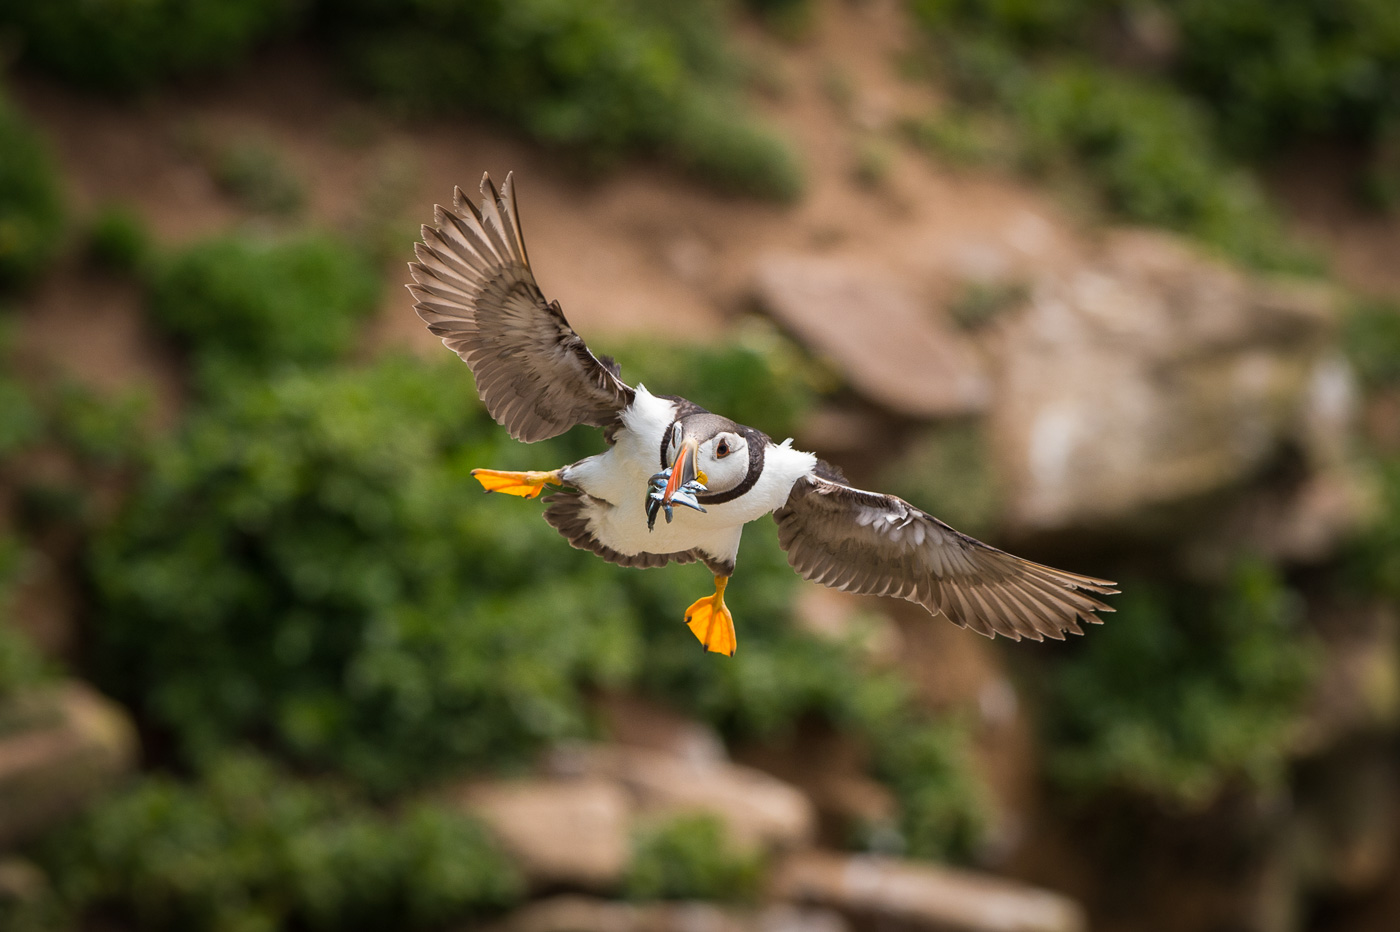 puffin_fly_wit_sandeels_fish_saltee_ireland